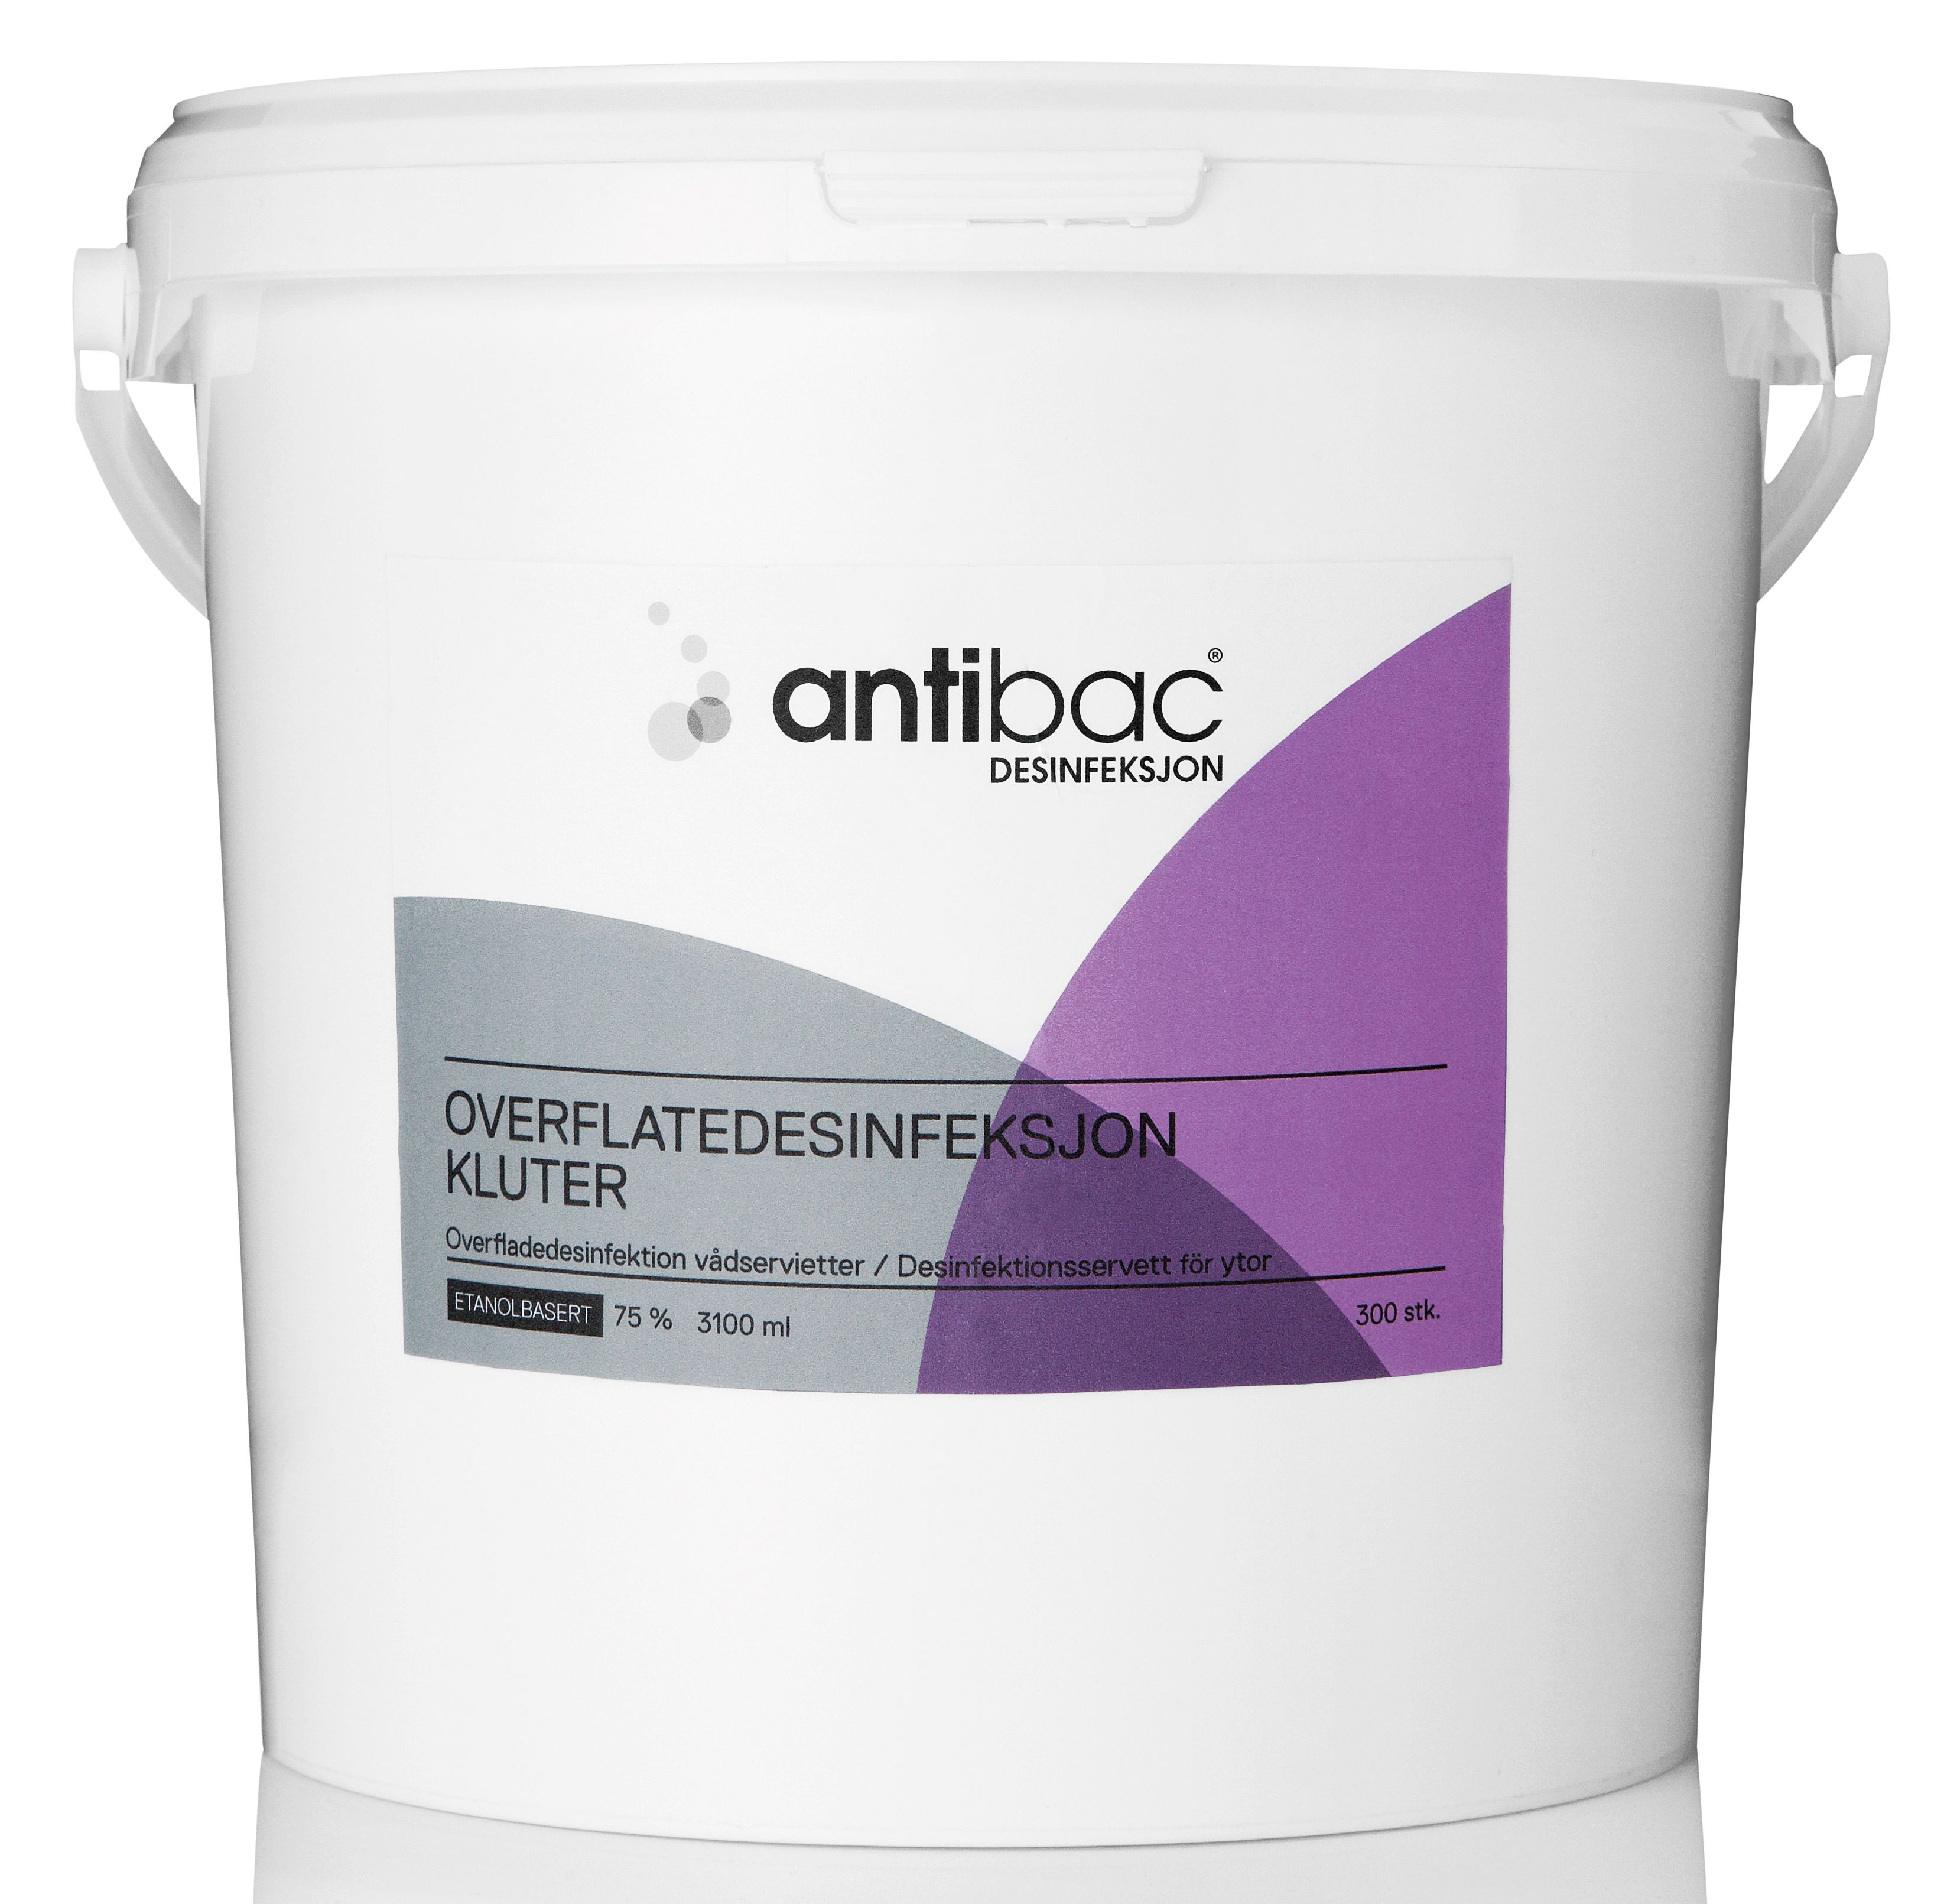 Antibac Overflatedesinfeksjon bøtte(300) 603047